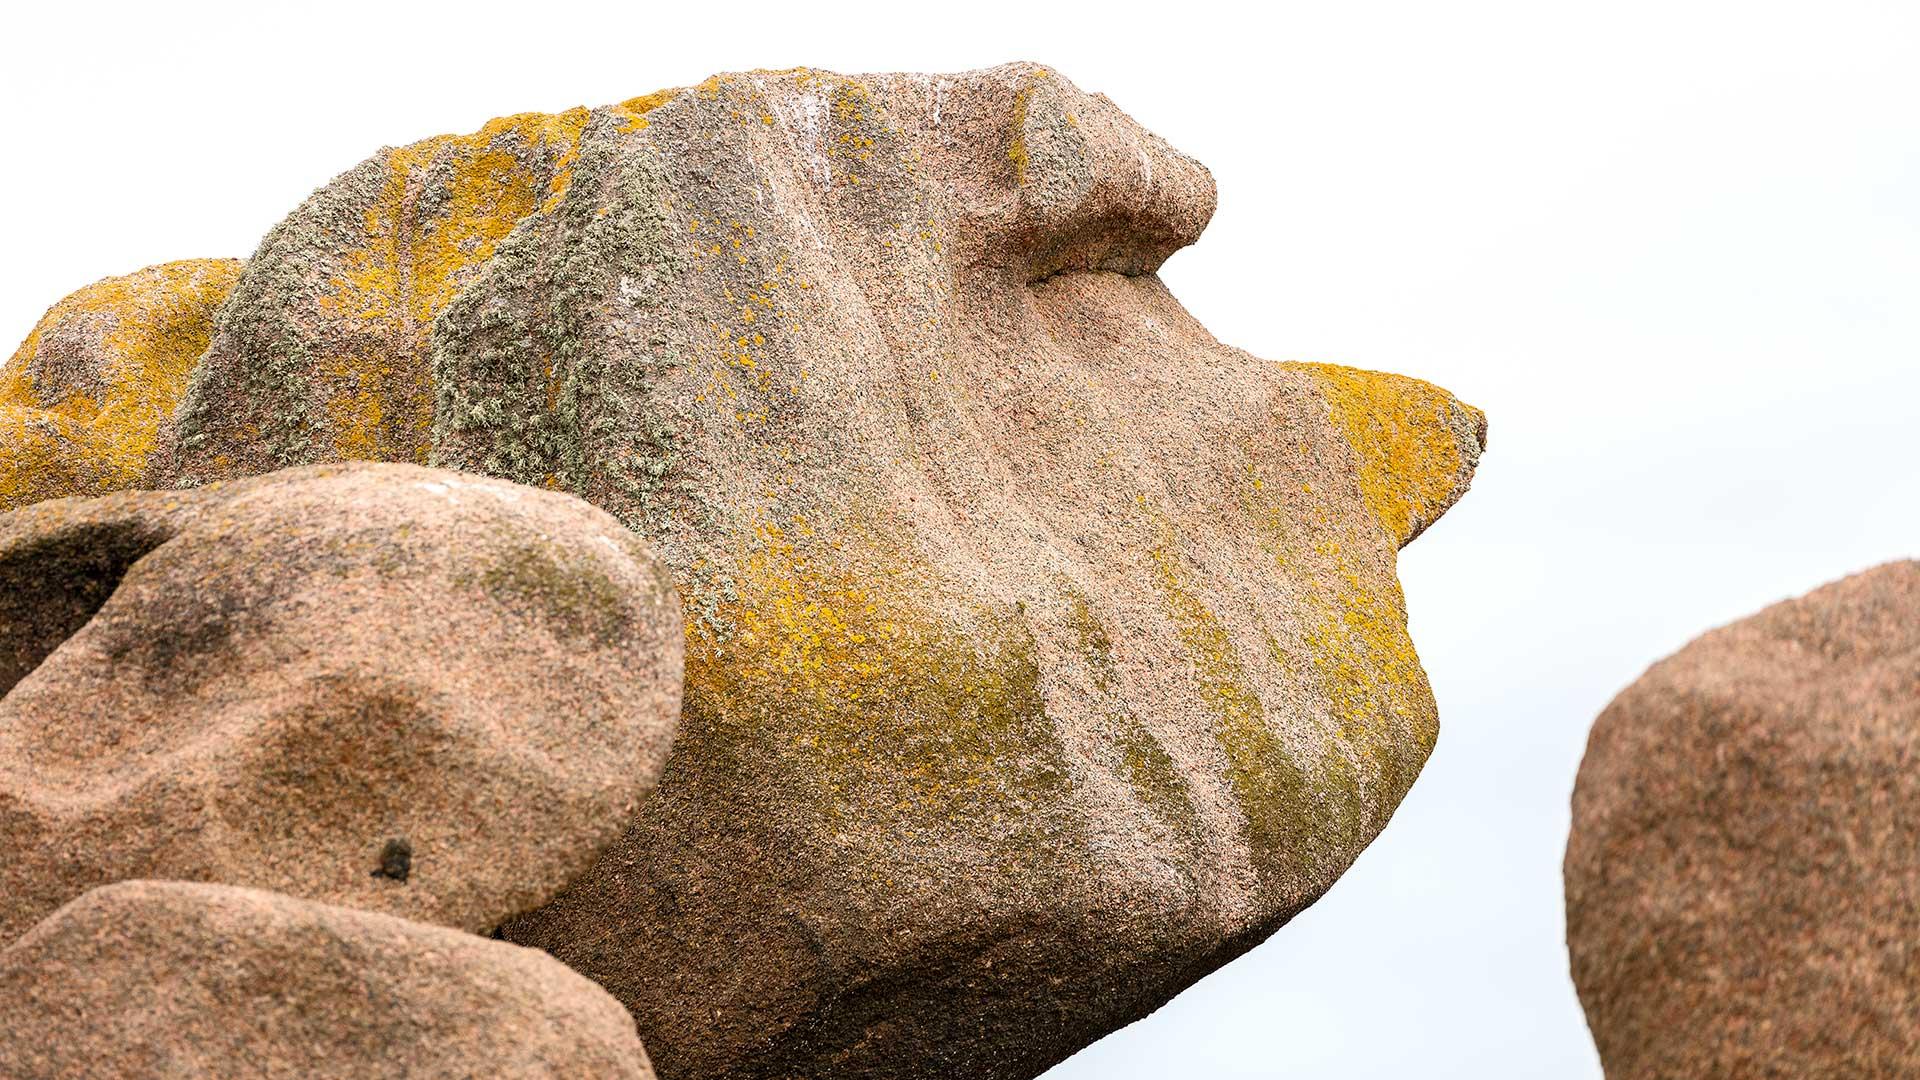 Landschaftsfotografie: Côte de Granit Rose – Donald Trump? | Foto: Dieter Eikenberg, imprints